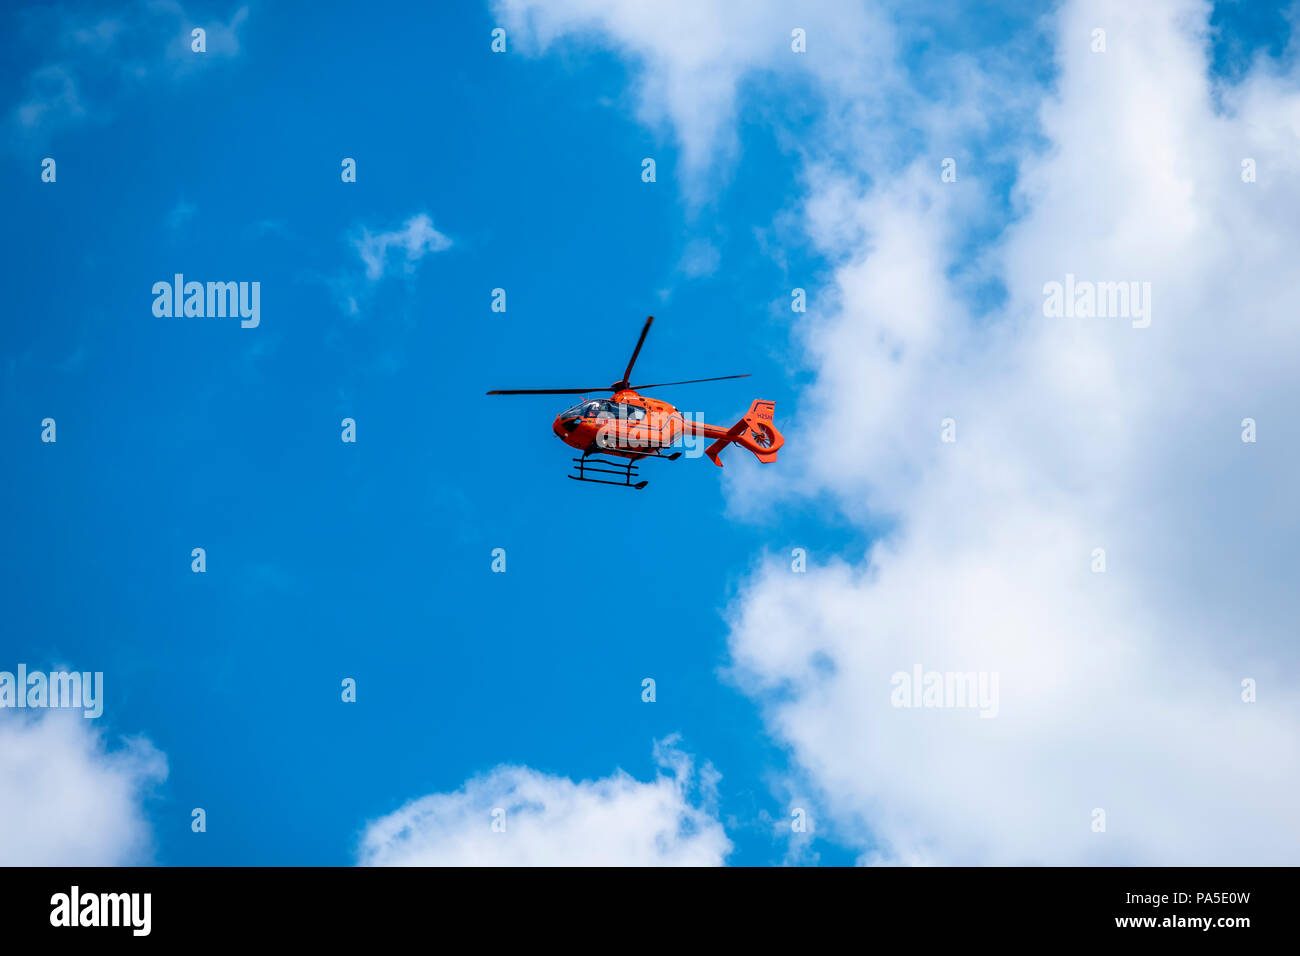 Rescue Helicopter Interior Stock Photos & Rescue